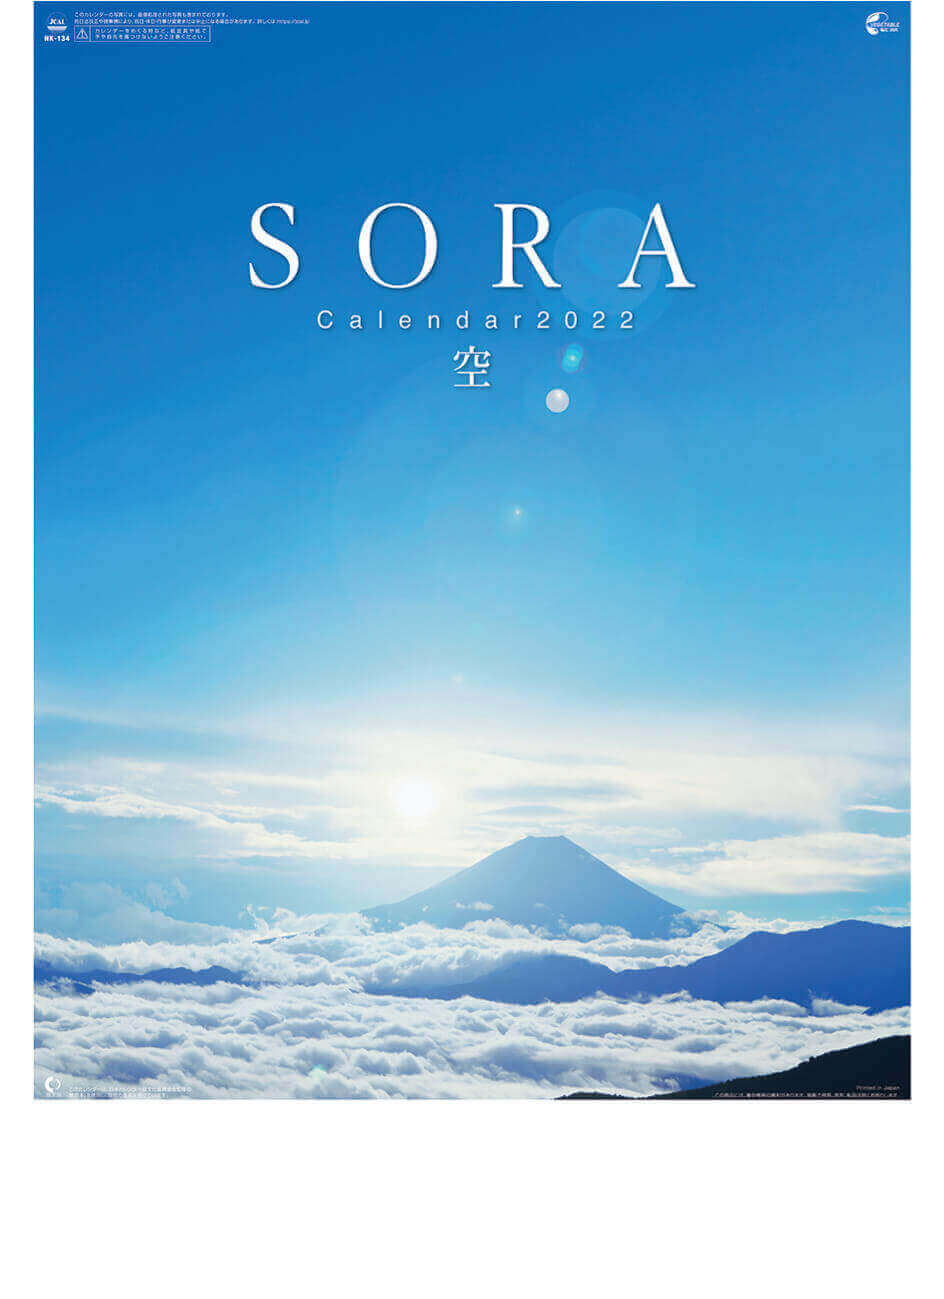 SORA -空- 2022年カレンダーの画像